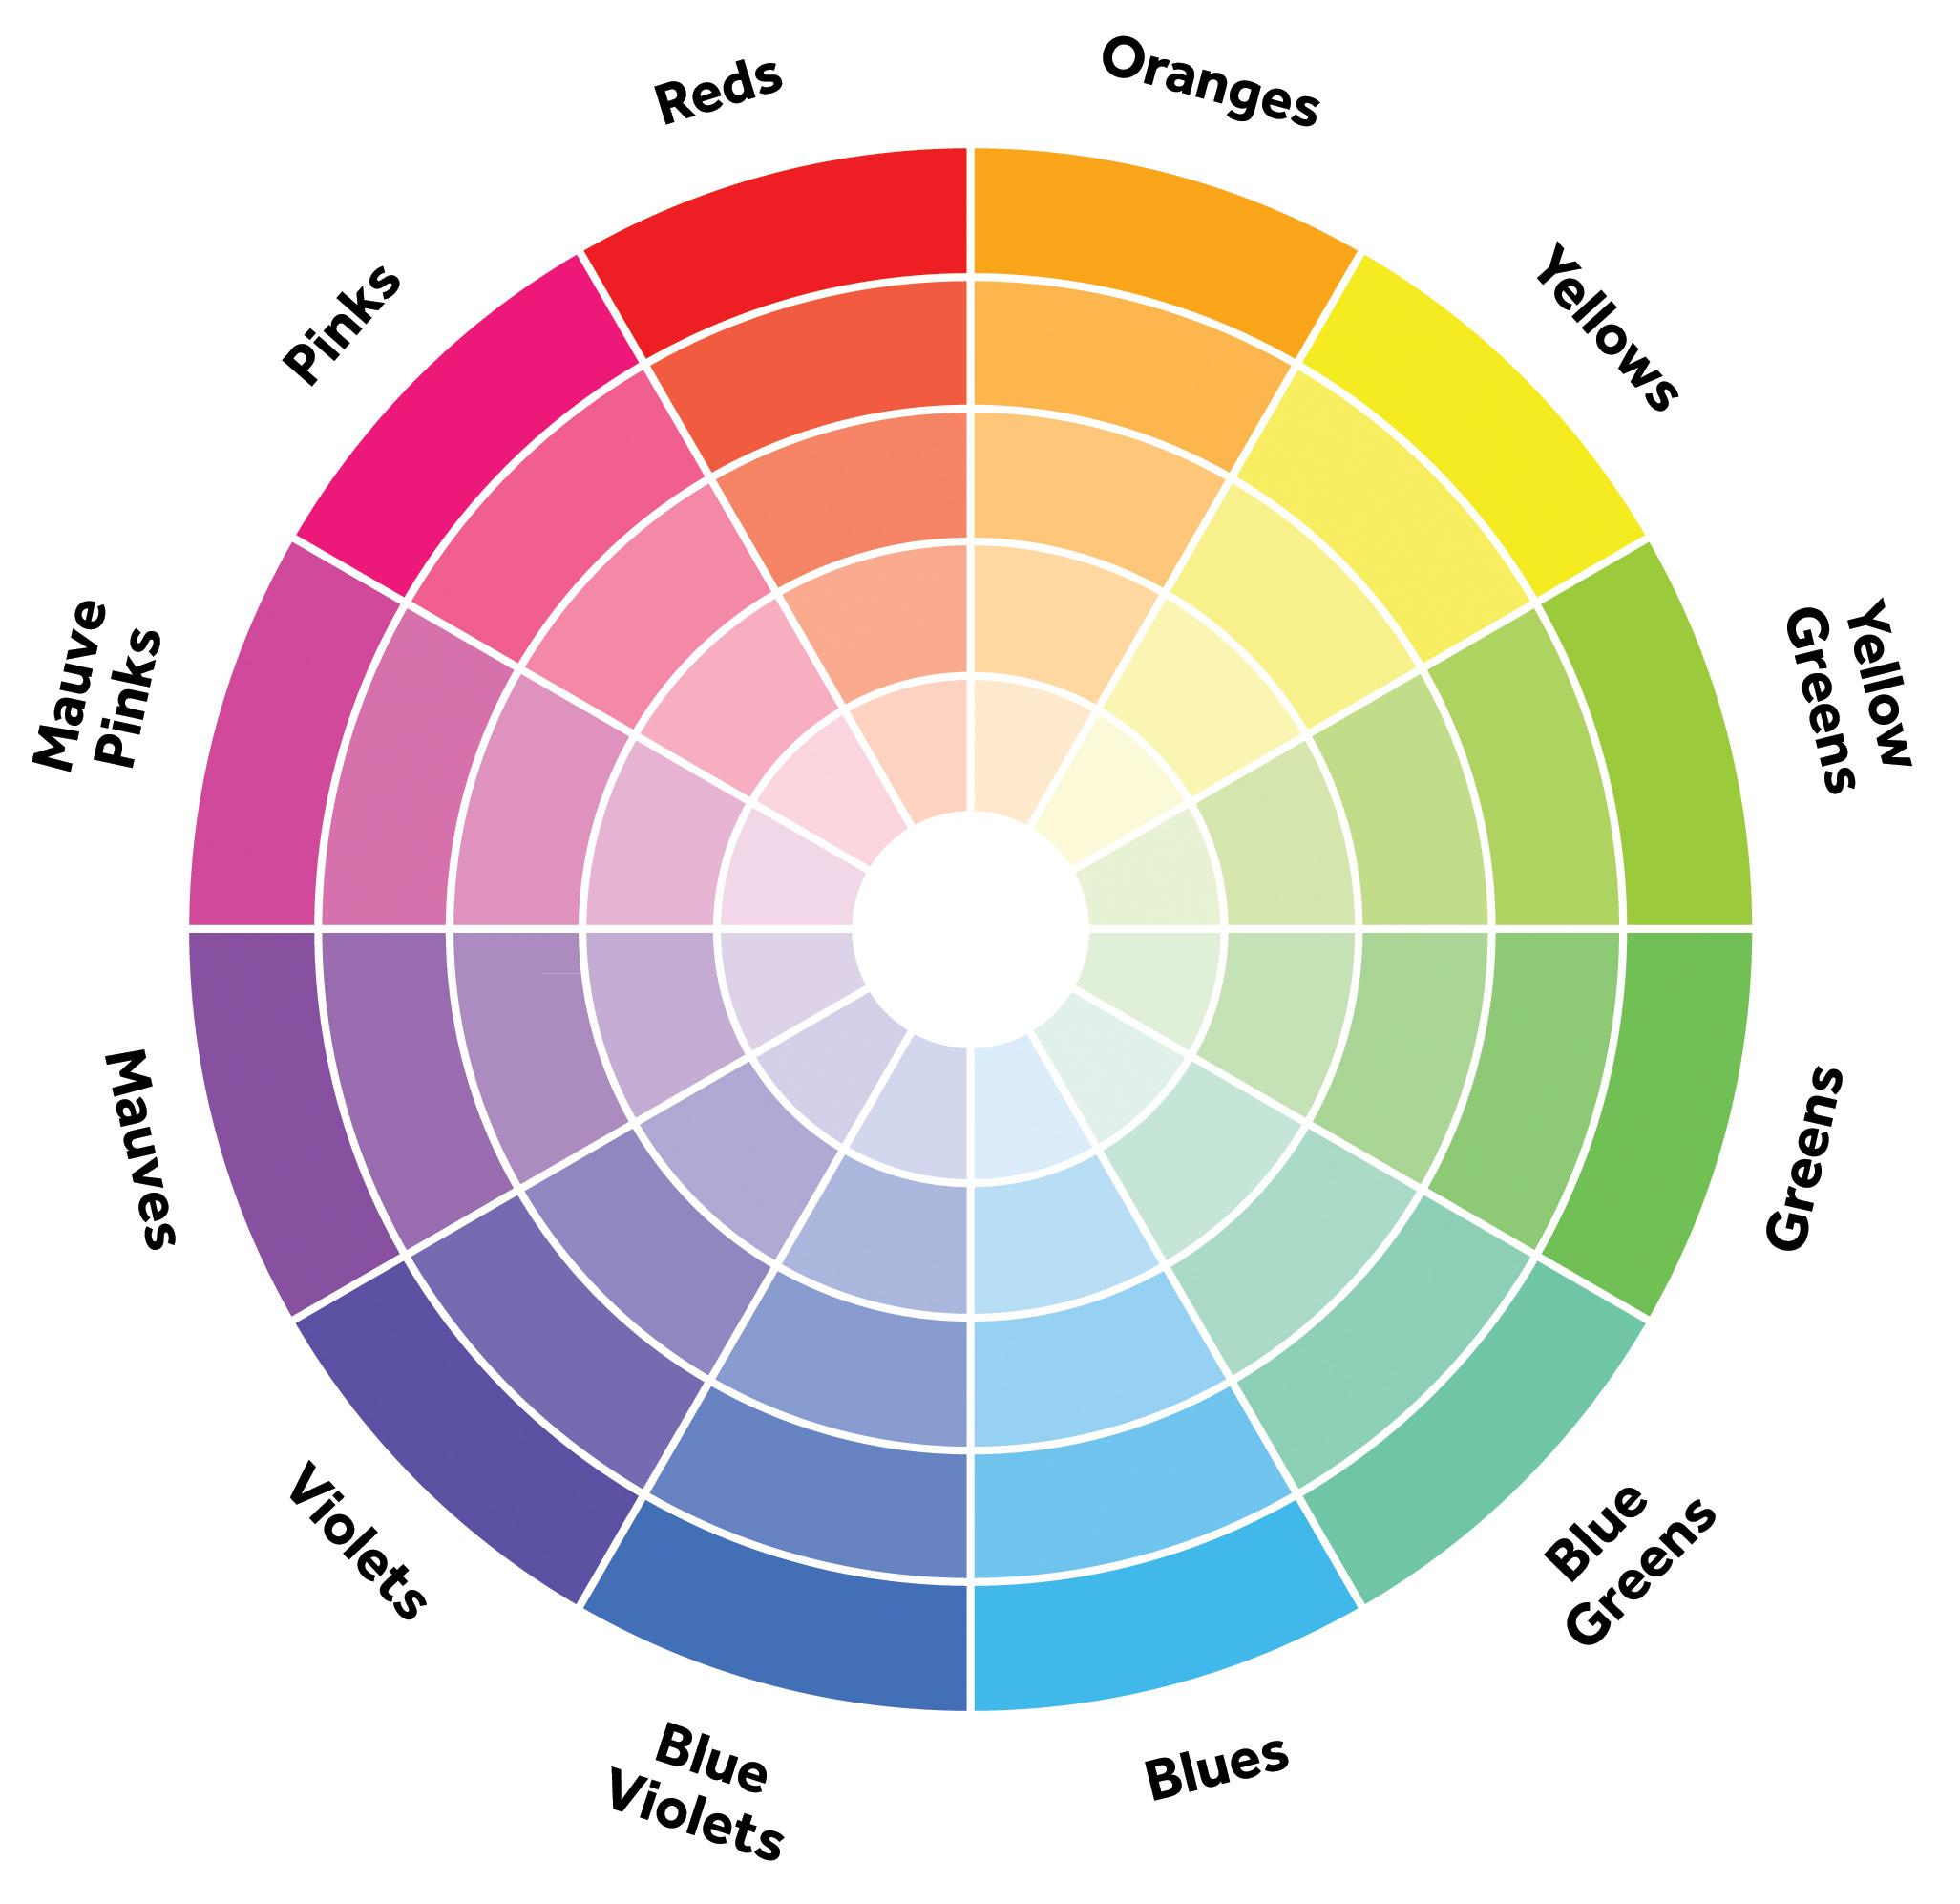 color-wheel_0-1.jpg